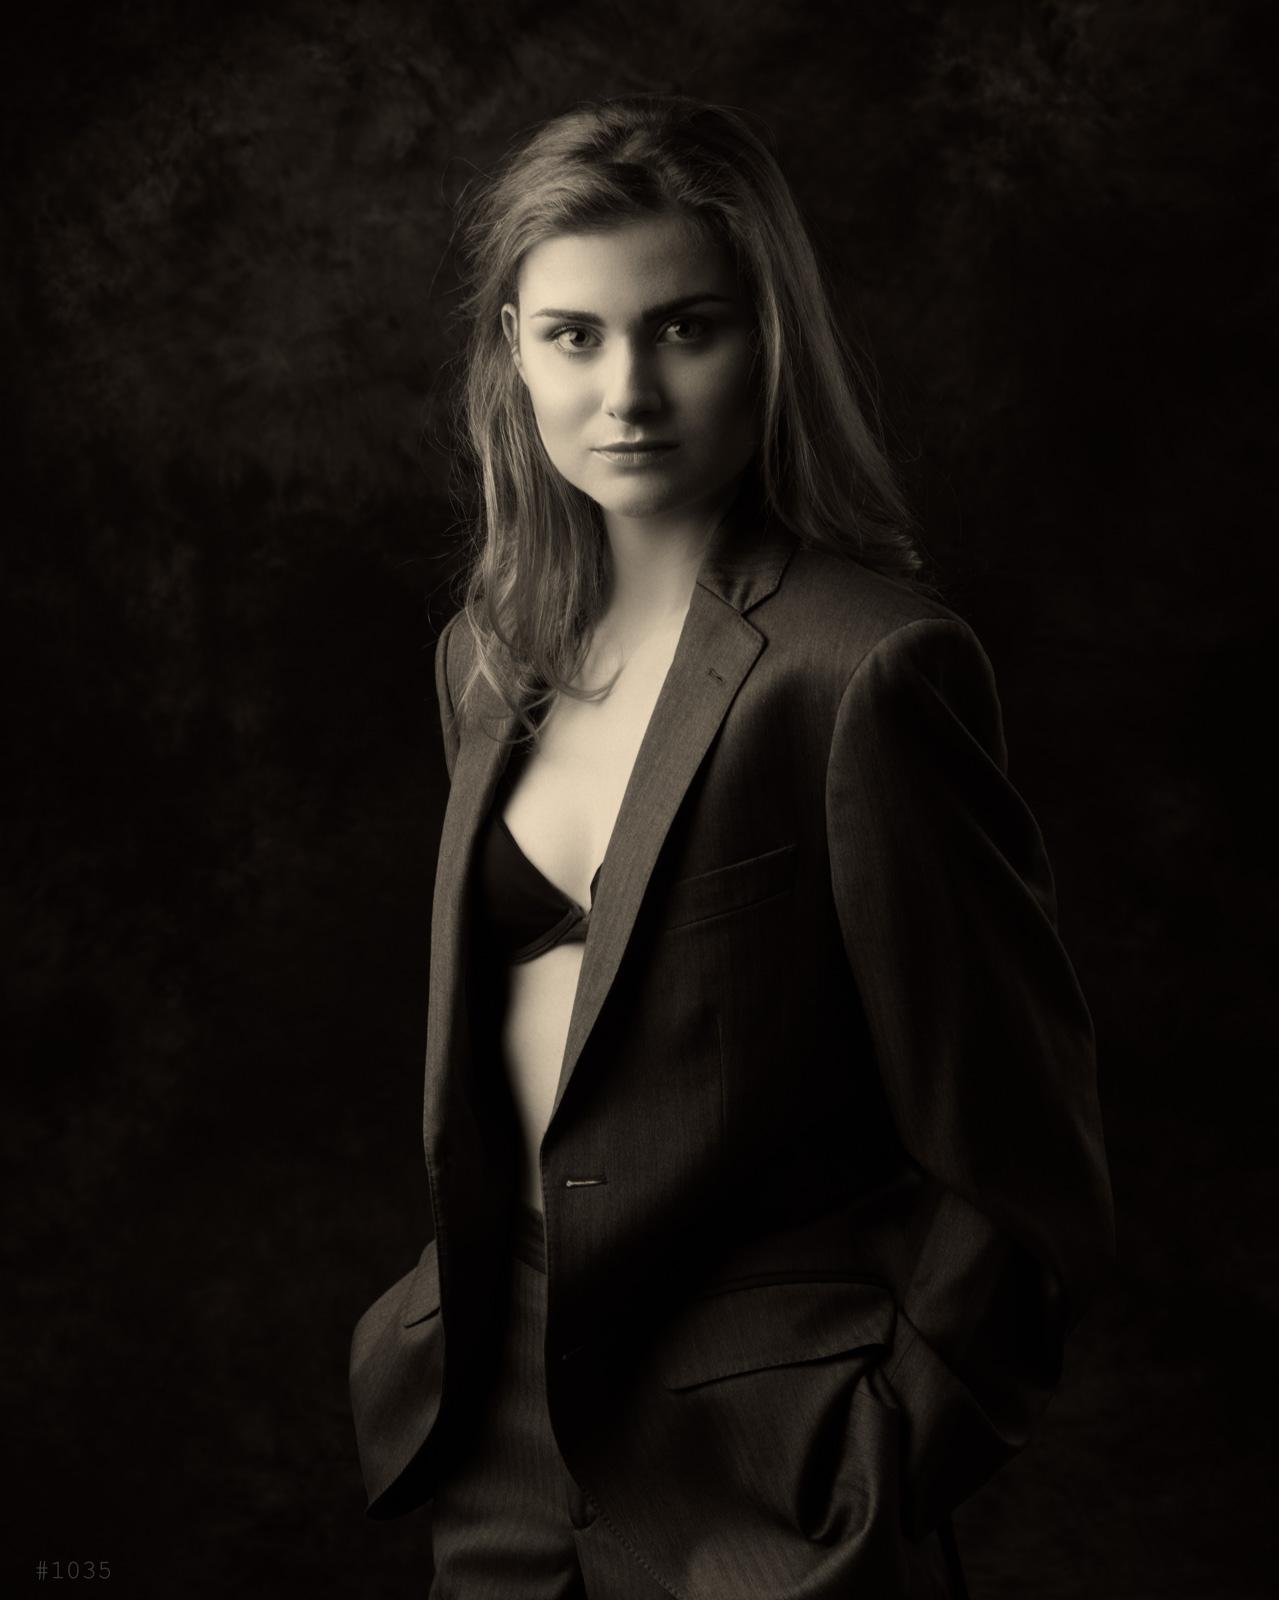 Pauline Kervio